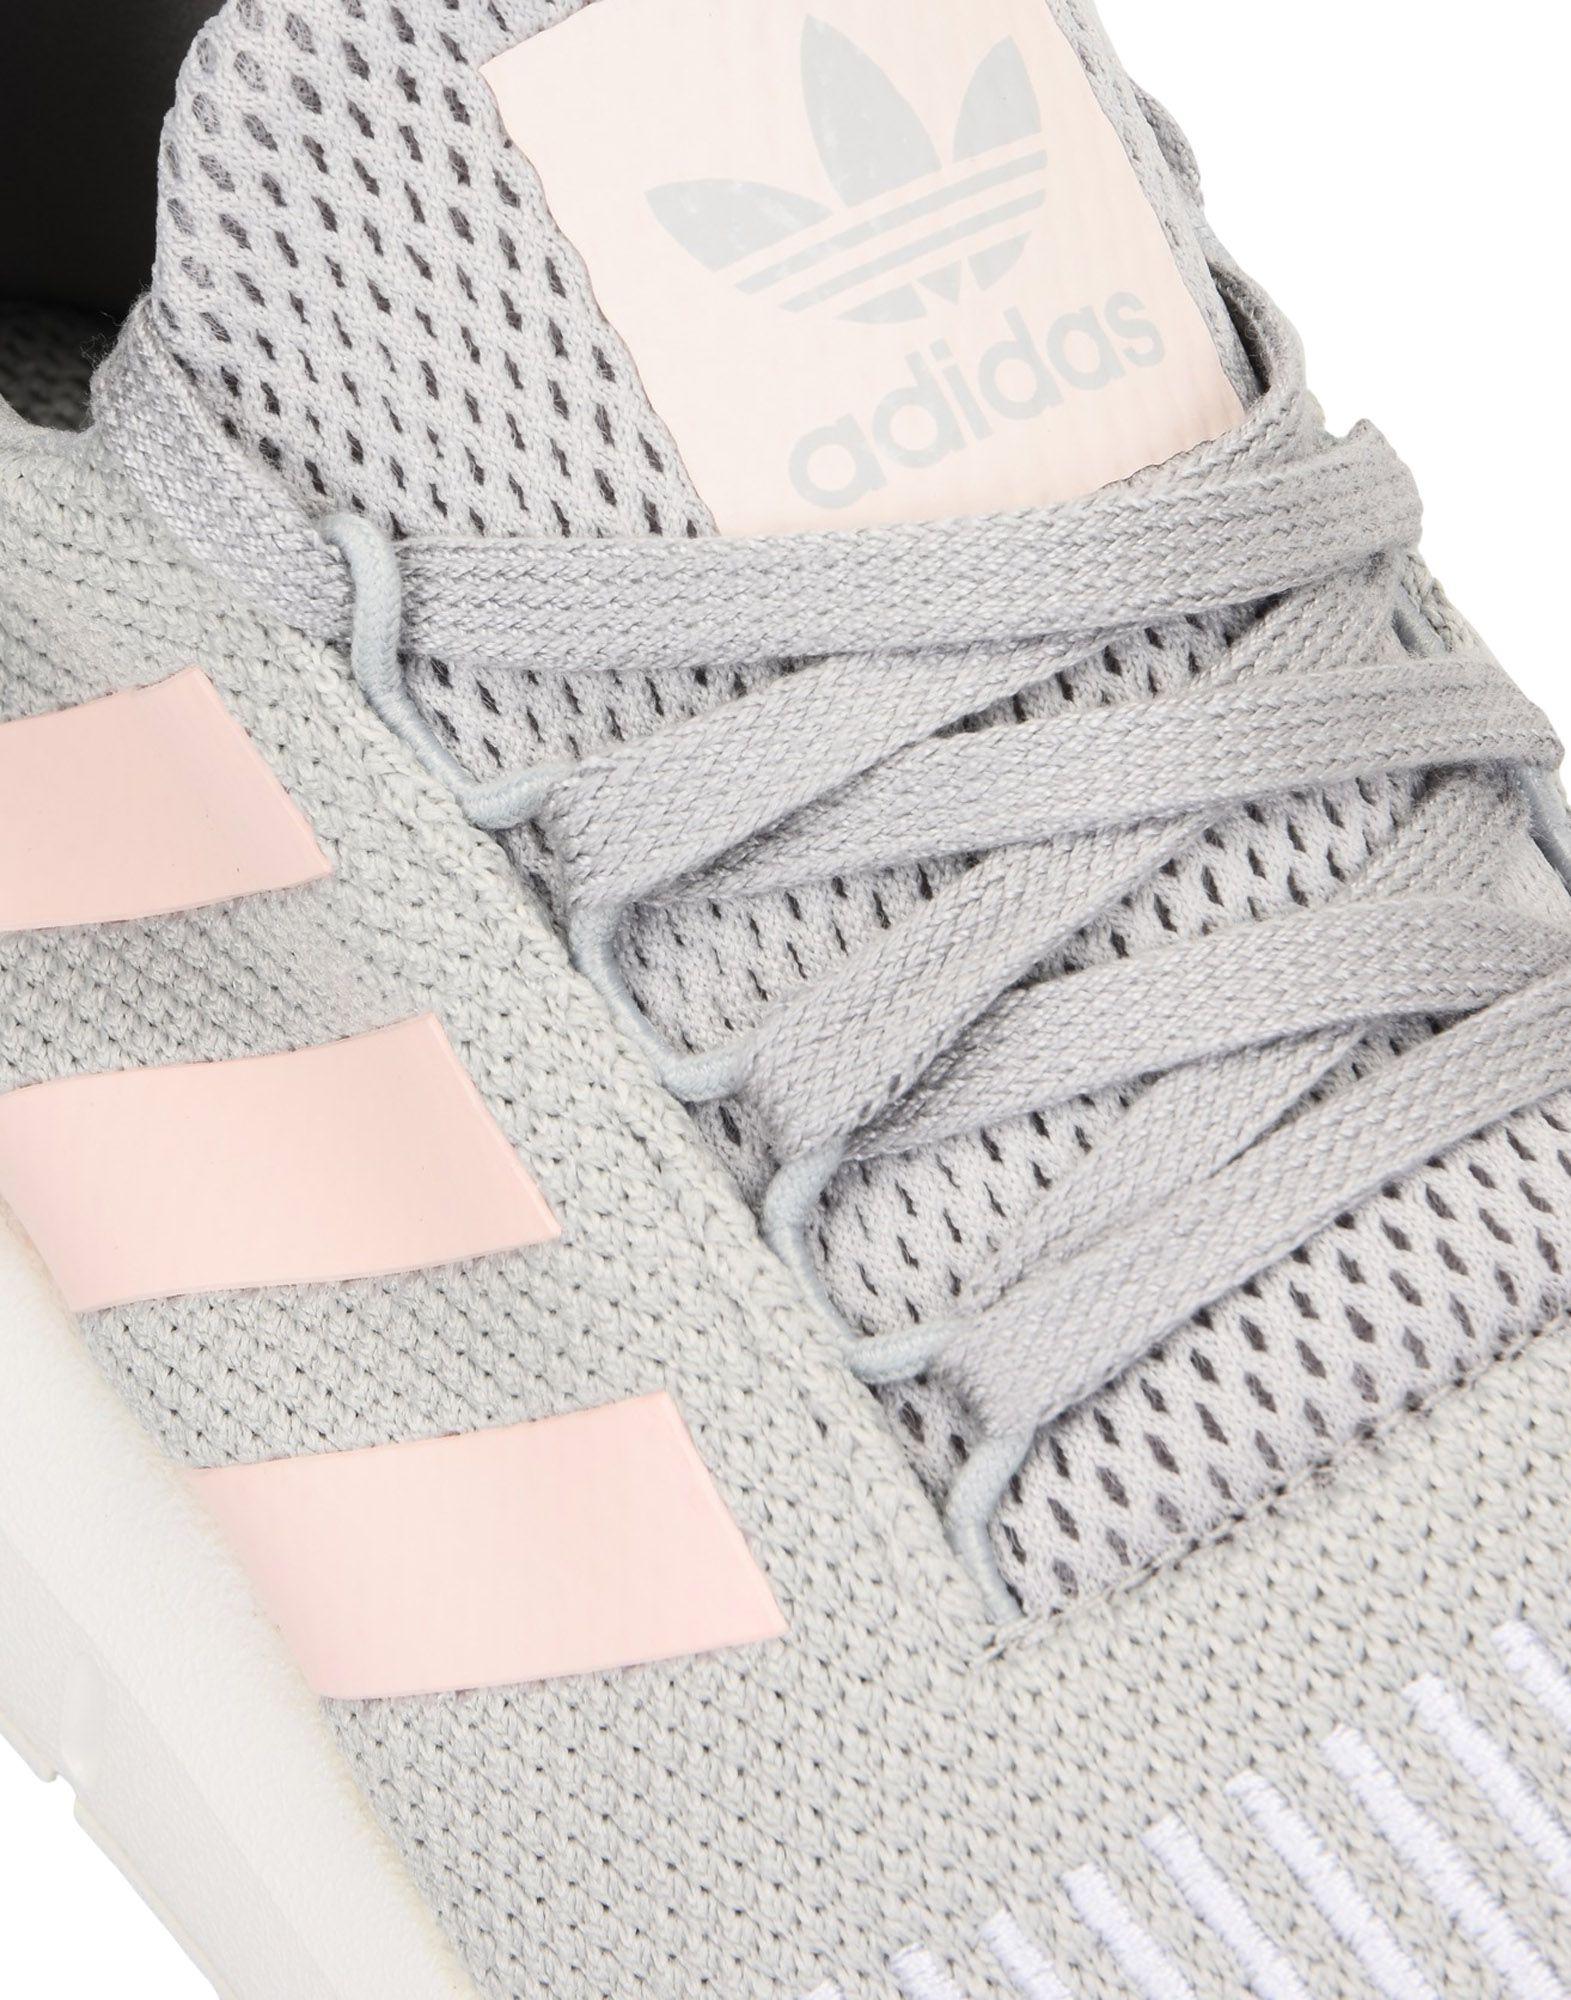 Sneakers Adidas Originals Swift Run W - Femme - Sneakers Adidas Originals sur